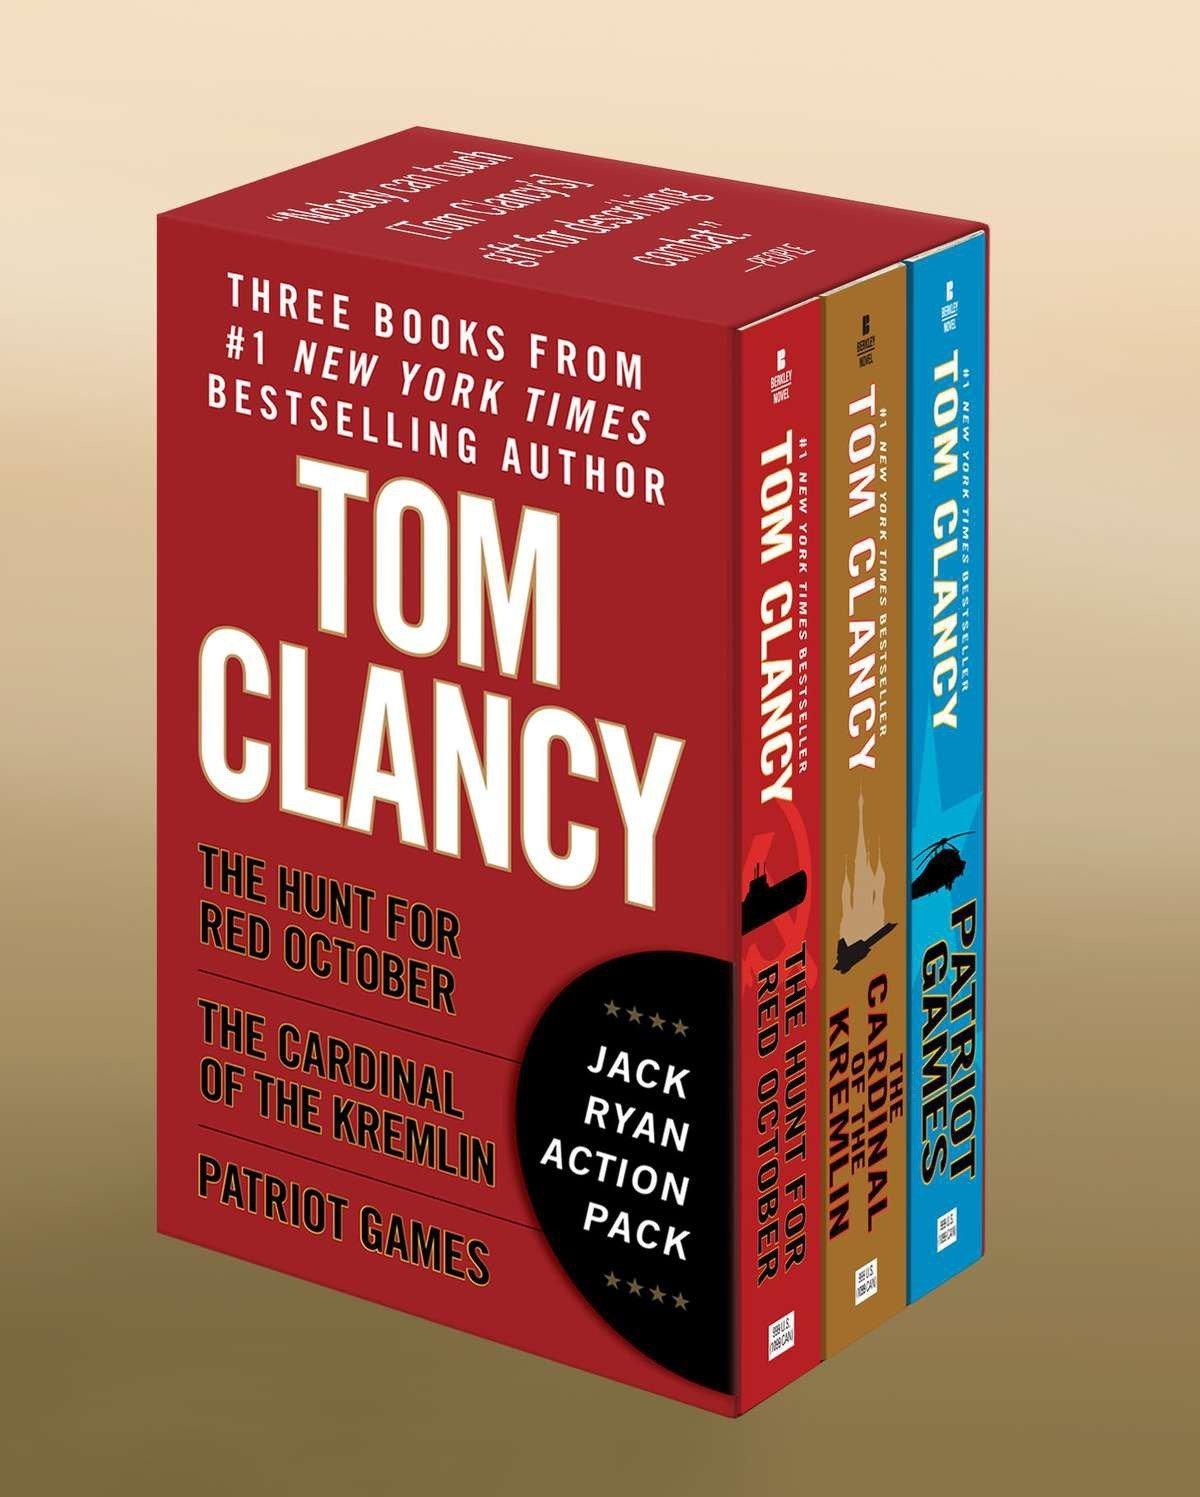 Tom Clancy's Jack Ryan Boxed Set (Books 1-3)